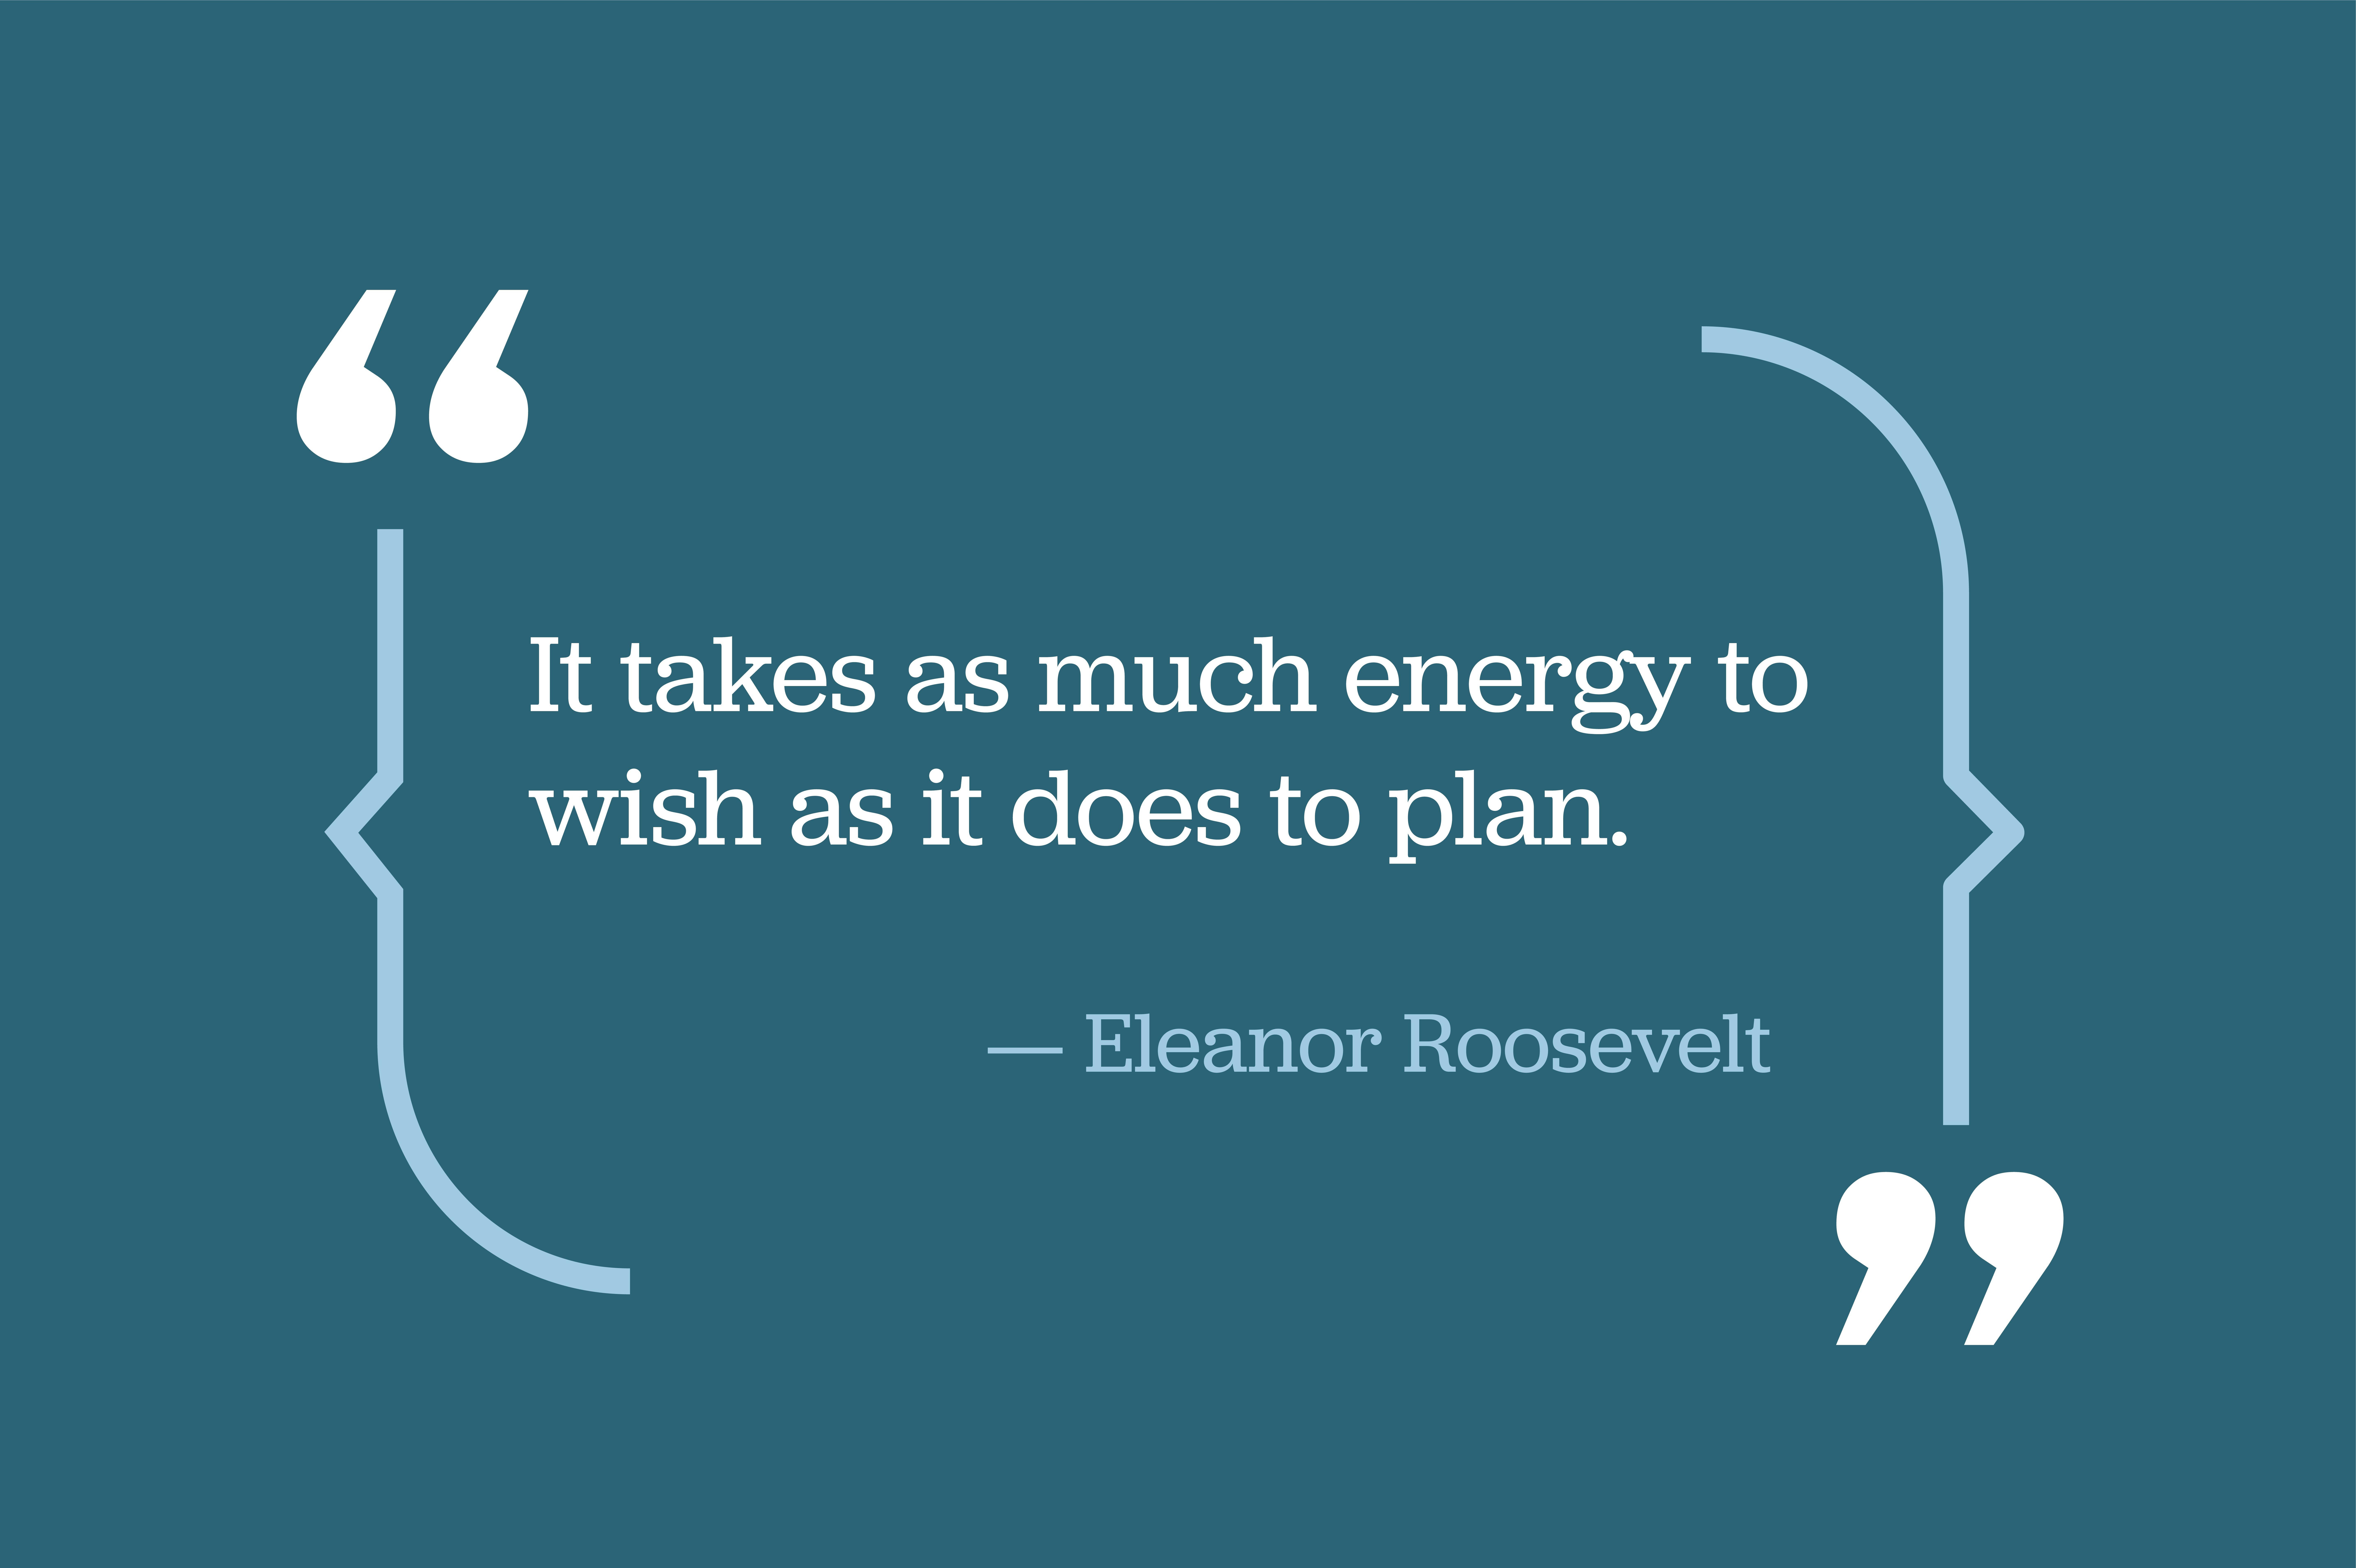 Eleanor Roosevelt Planning Quote